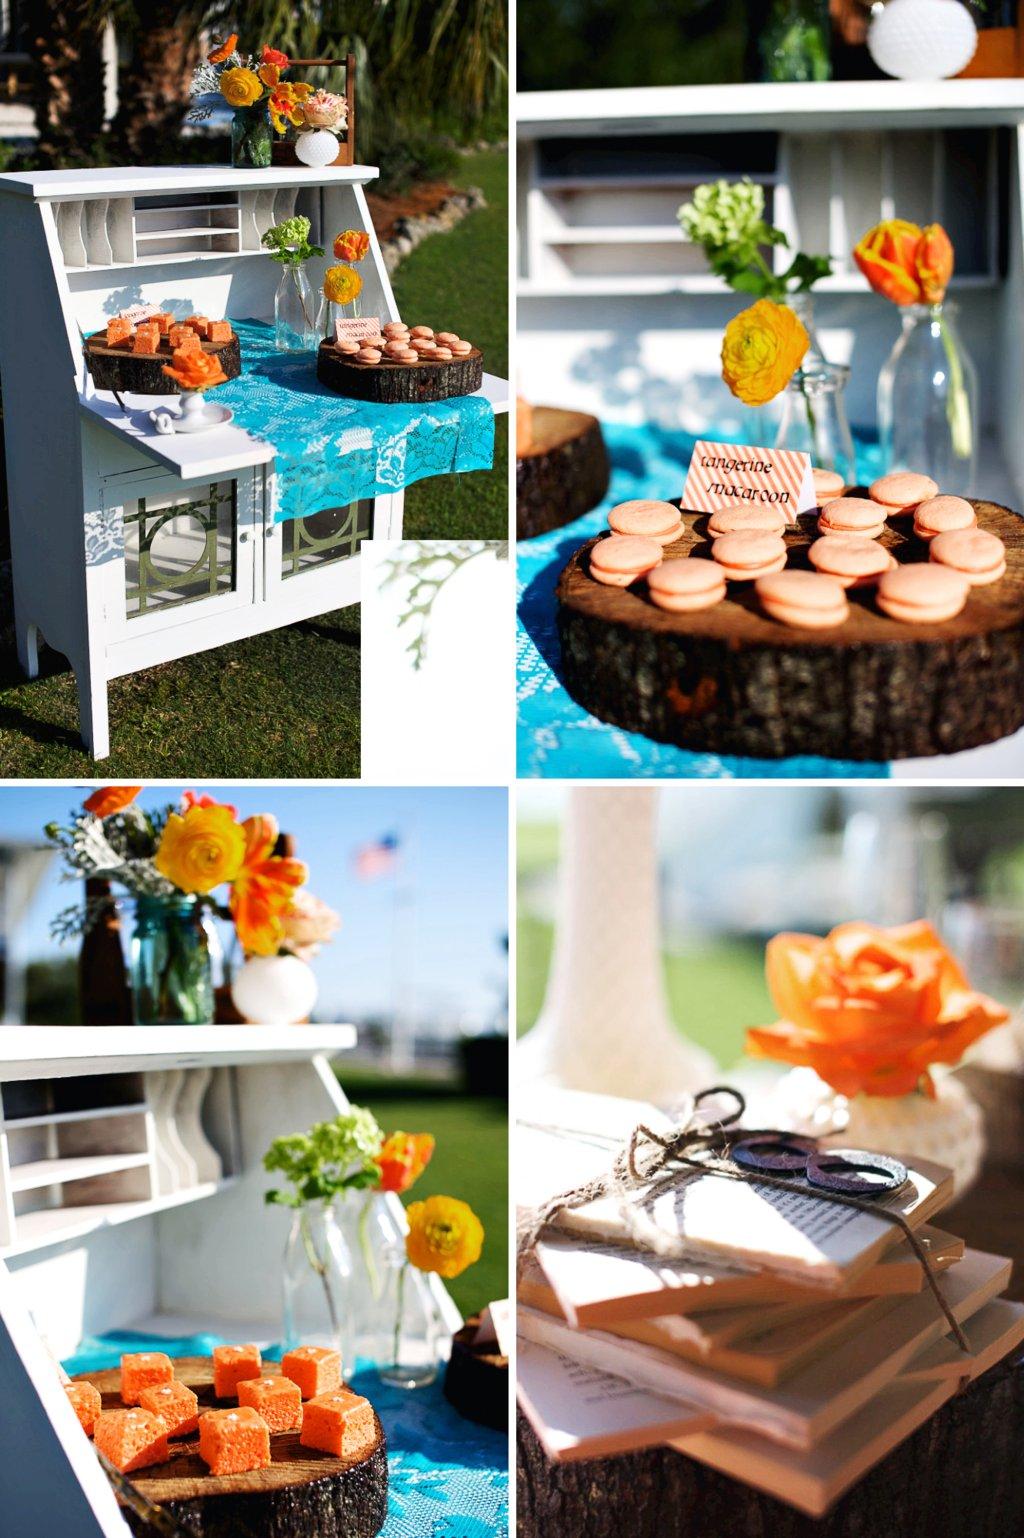 Rustic-citrus-wedding-inspiration-outdoor-wedding-details-dessert.full